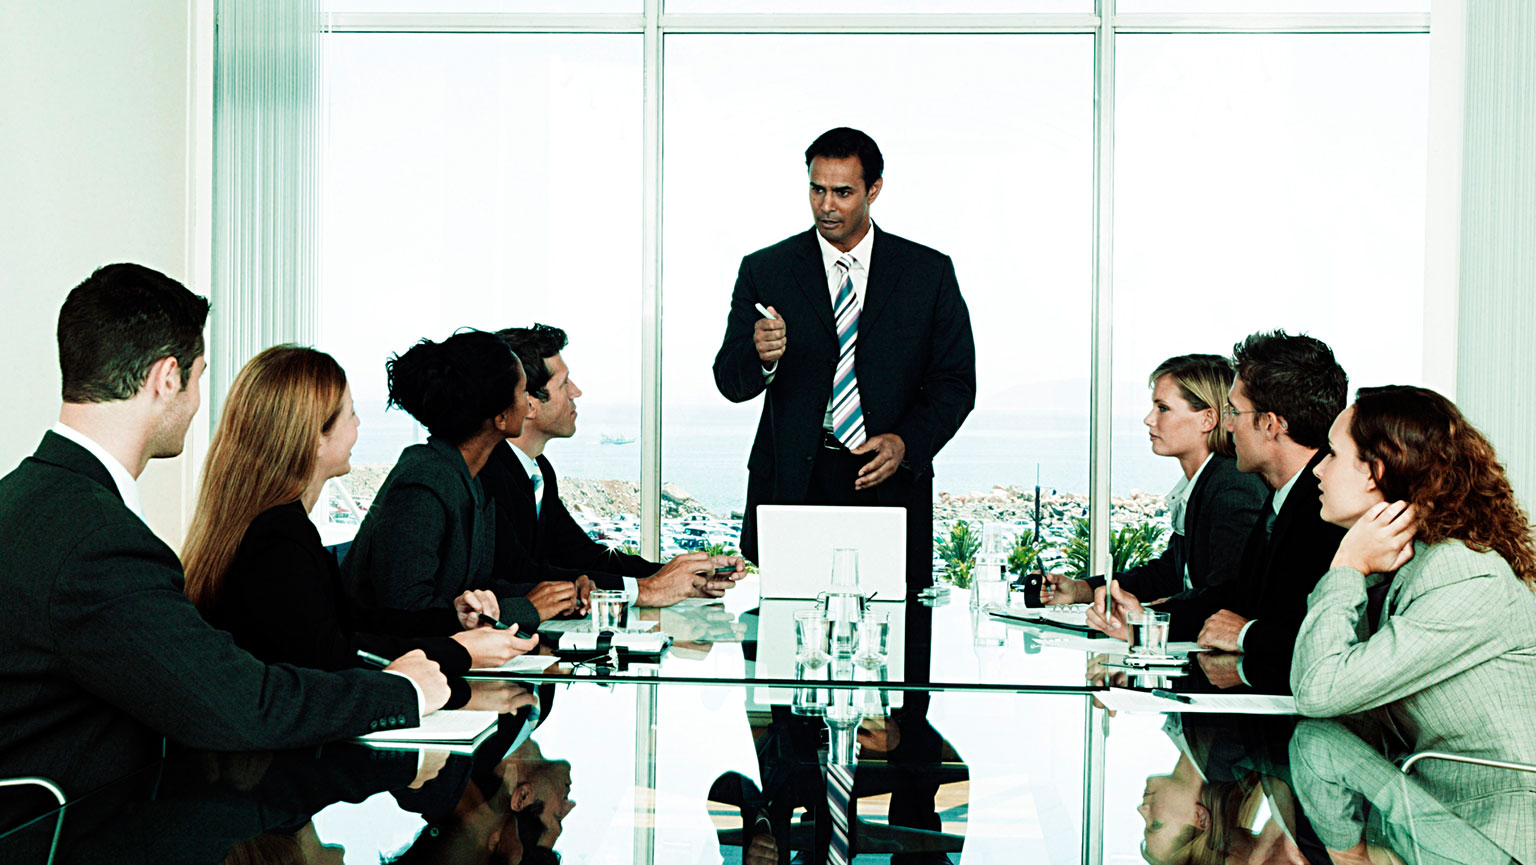 Organizational Behavior: The Value of Great Leadership